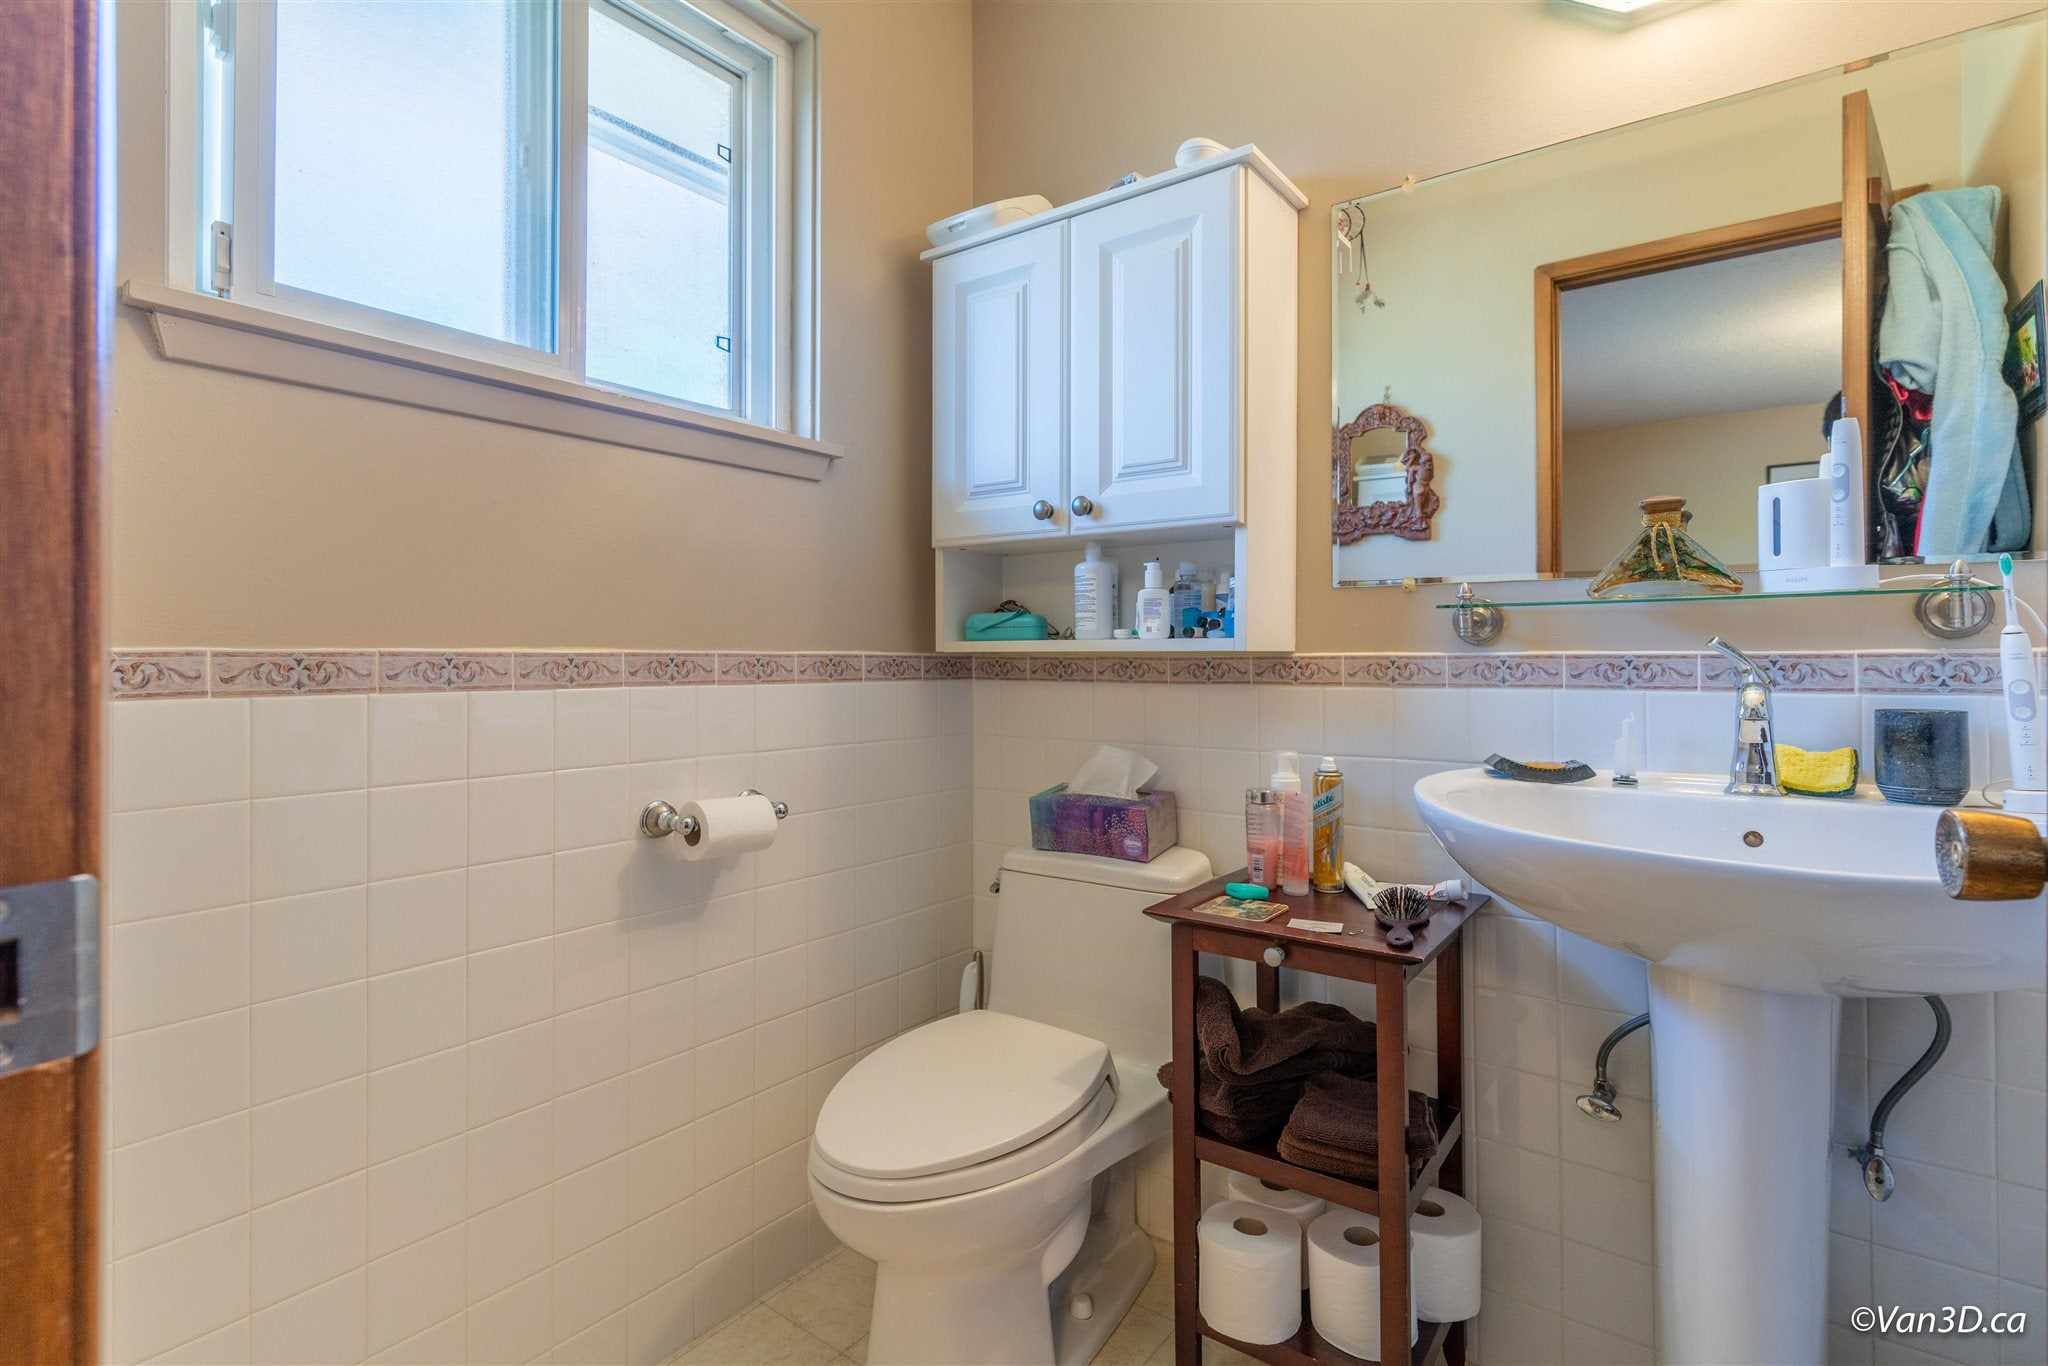 14495 MANN PARK CRESCENT - White Rock House/Single Family for sale, 4 Bedrooms (R2604561) - #15